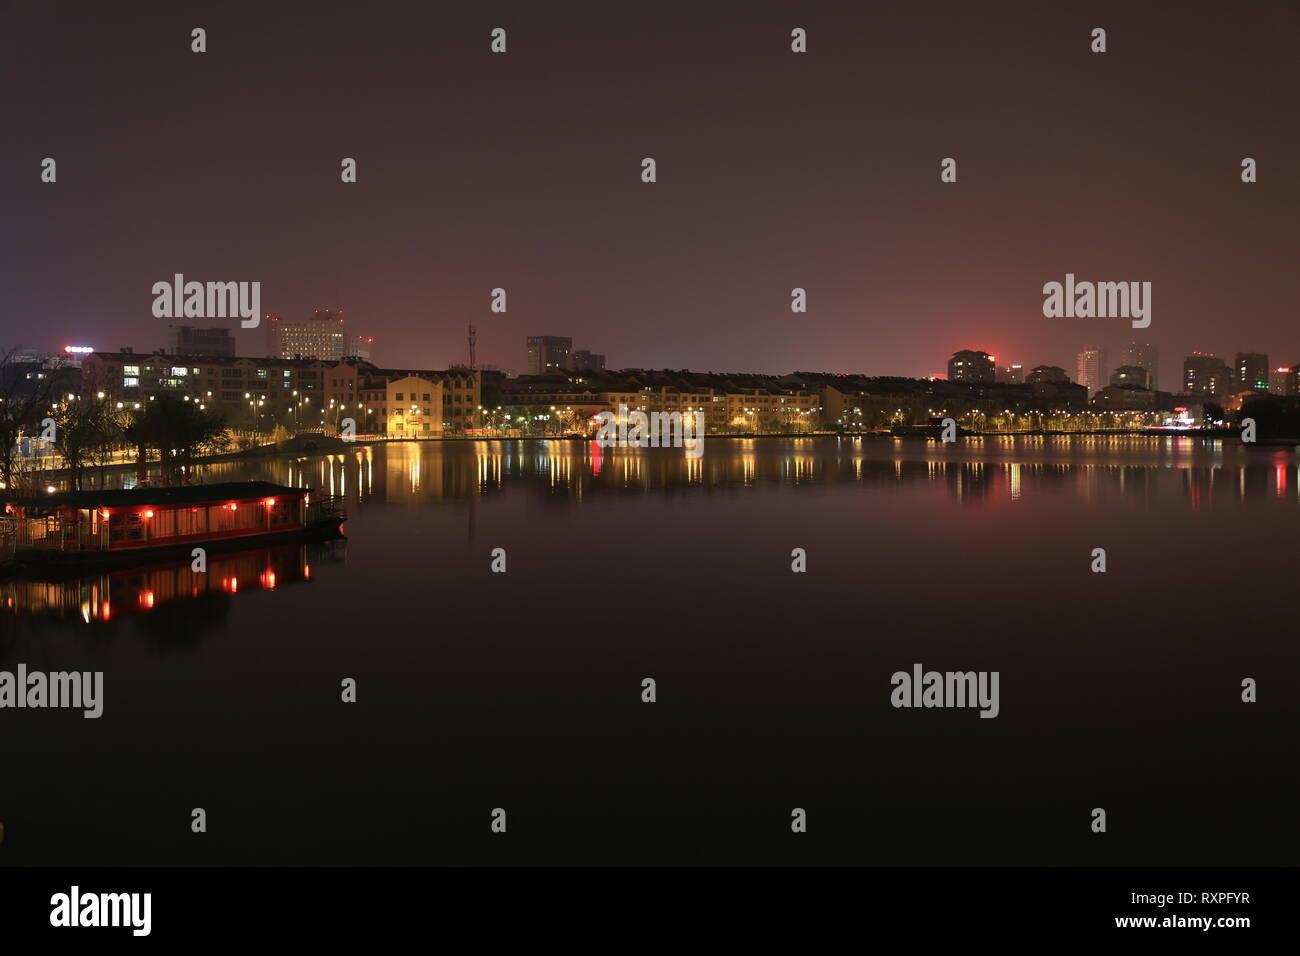 Dongchang Lago di notte, Liaocheng Città, Provincia dello Shandong, Cina. Immagini Stock